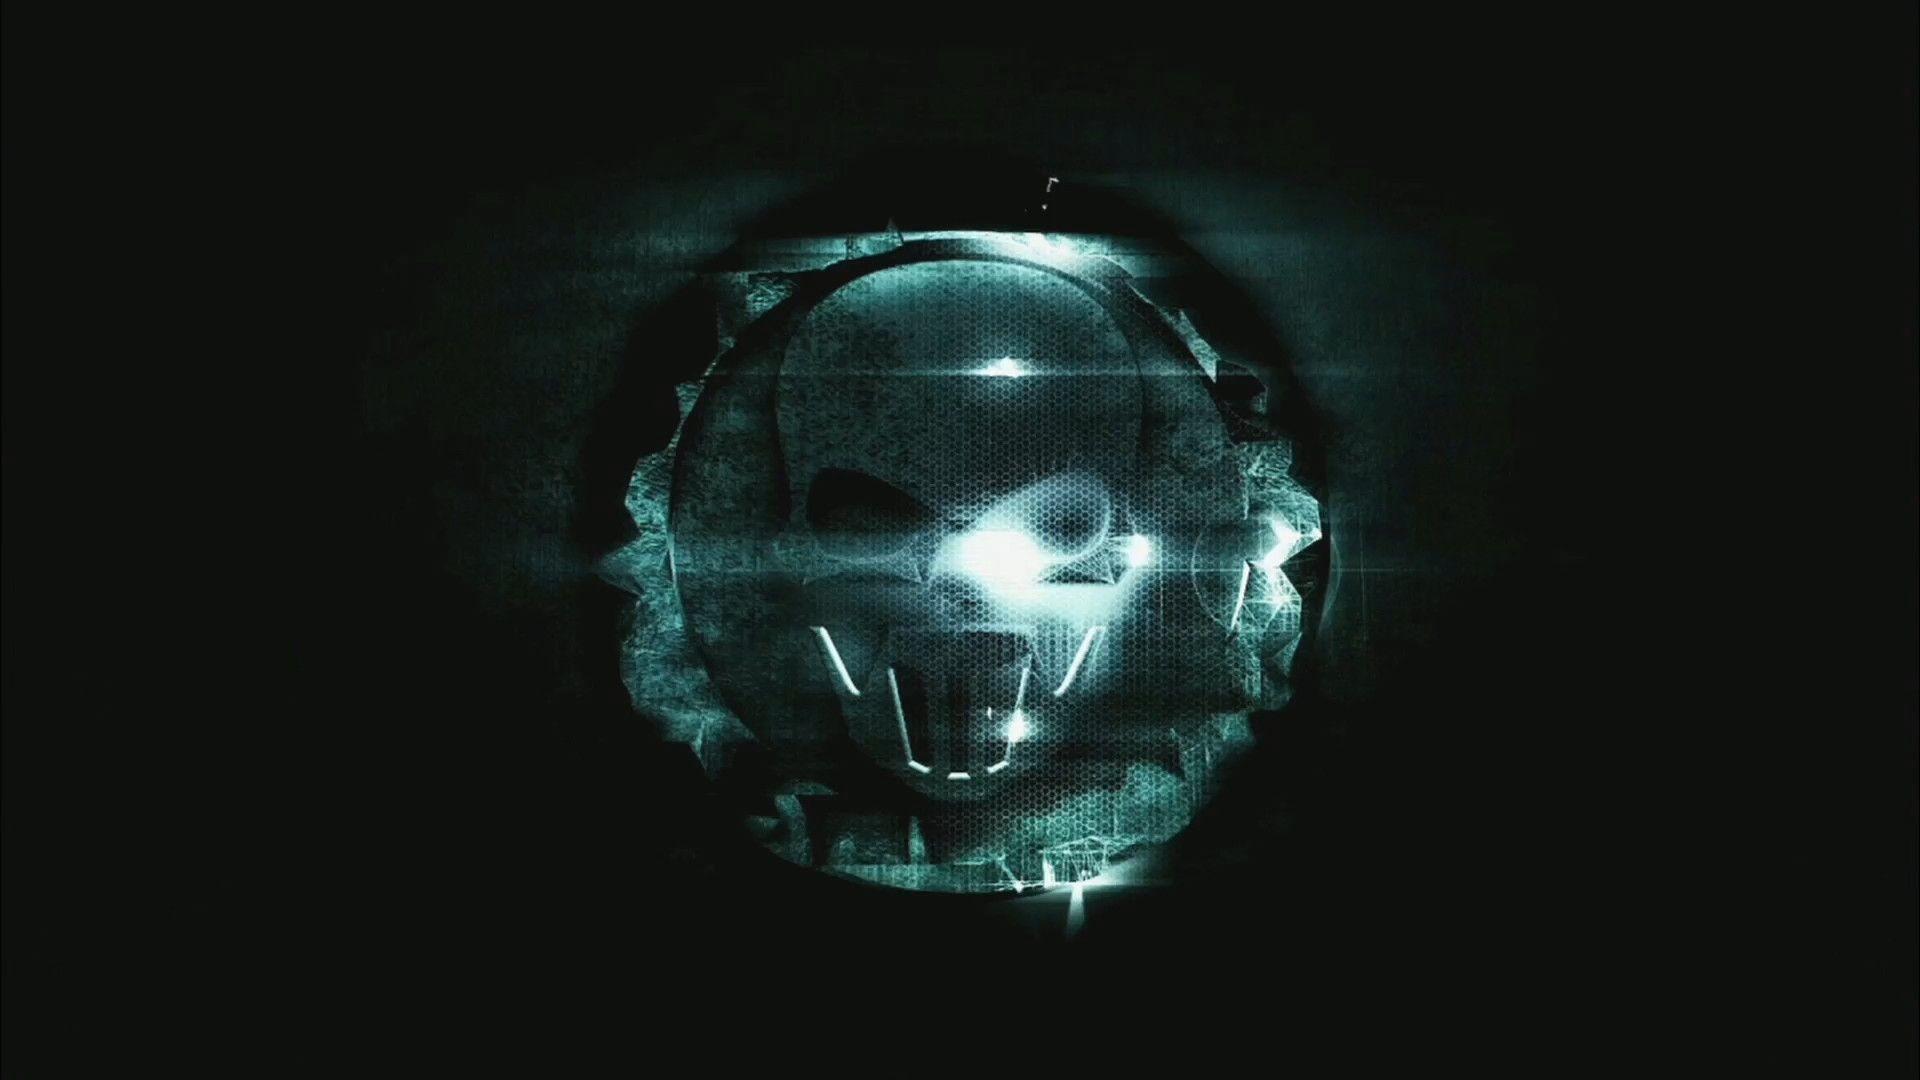 Skull Soldier Wallpaper Hd 69 Images